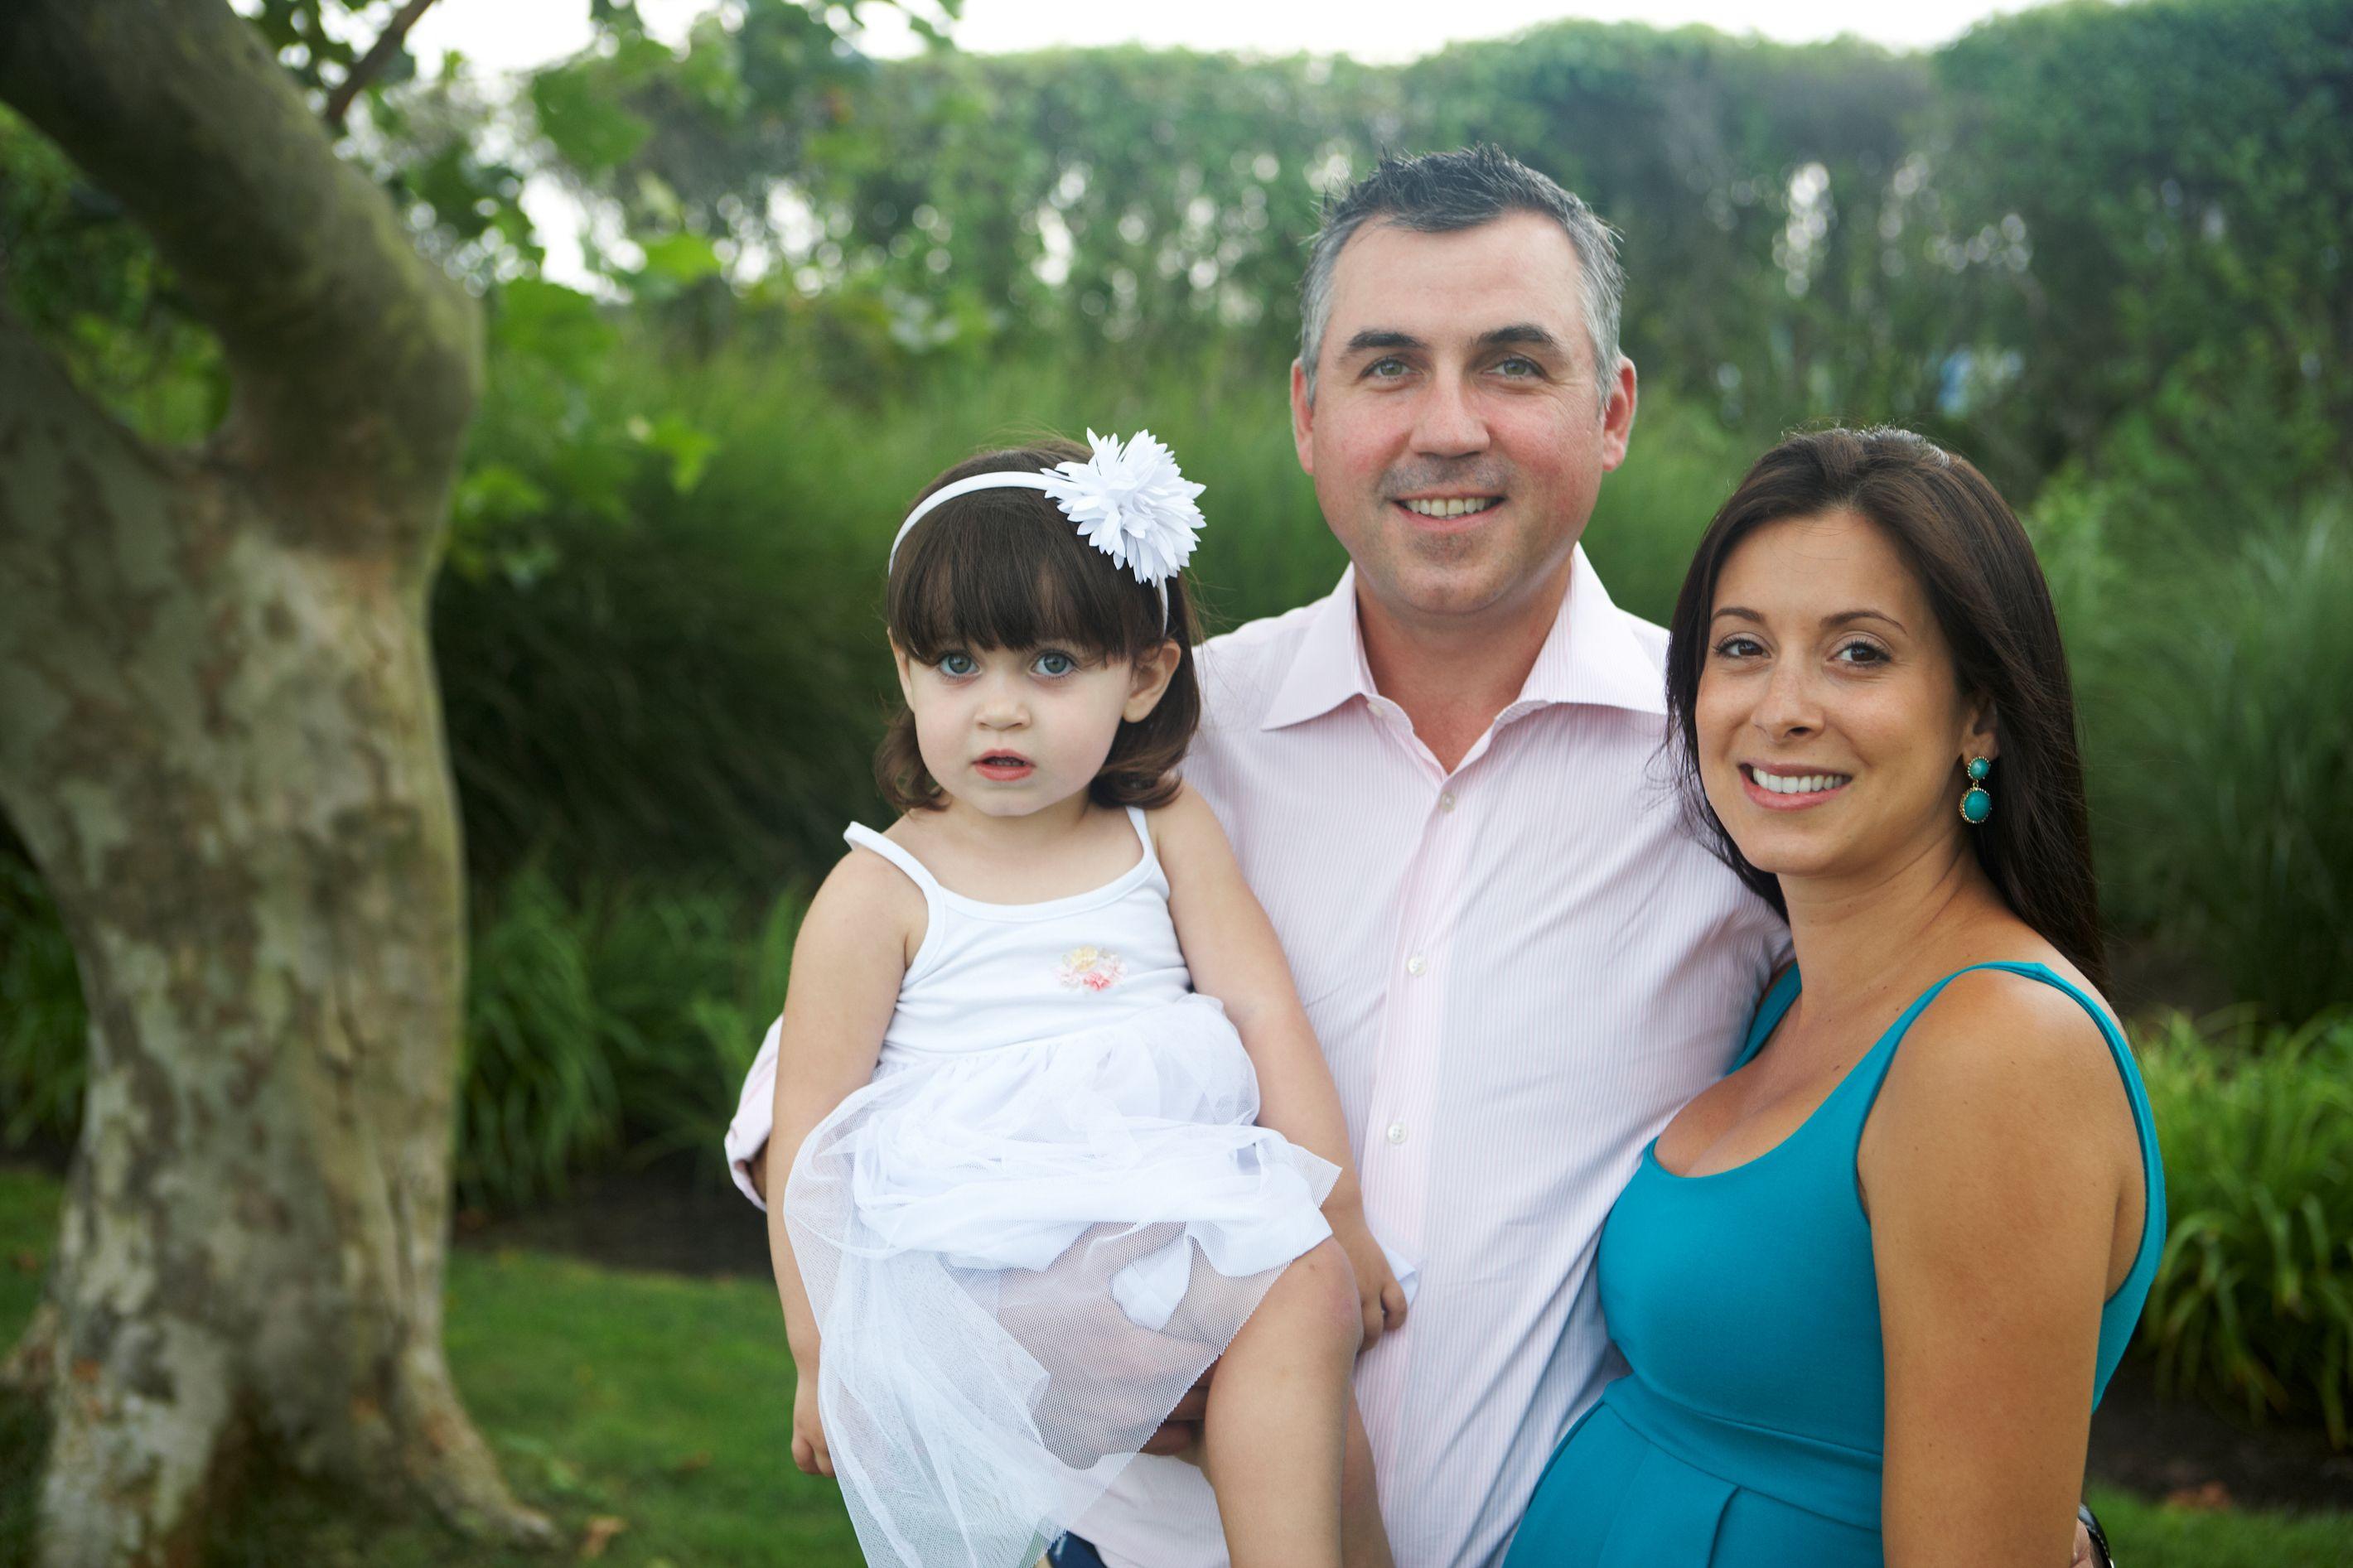 201208_Oneill_Family_Portraits_043.jpg